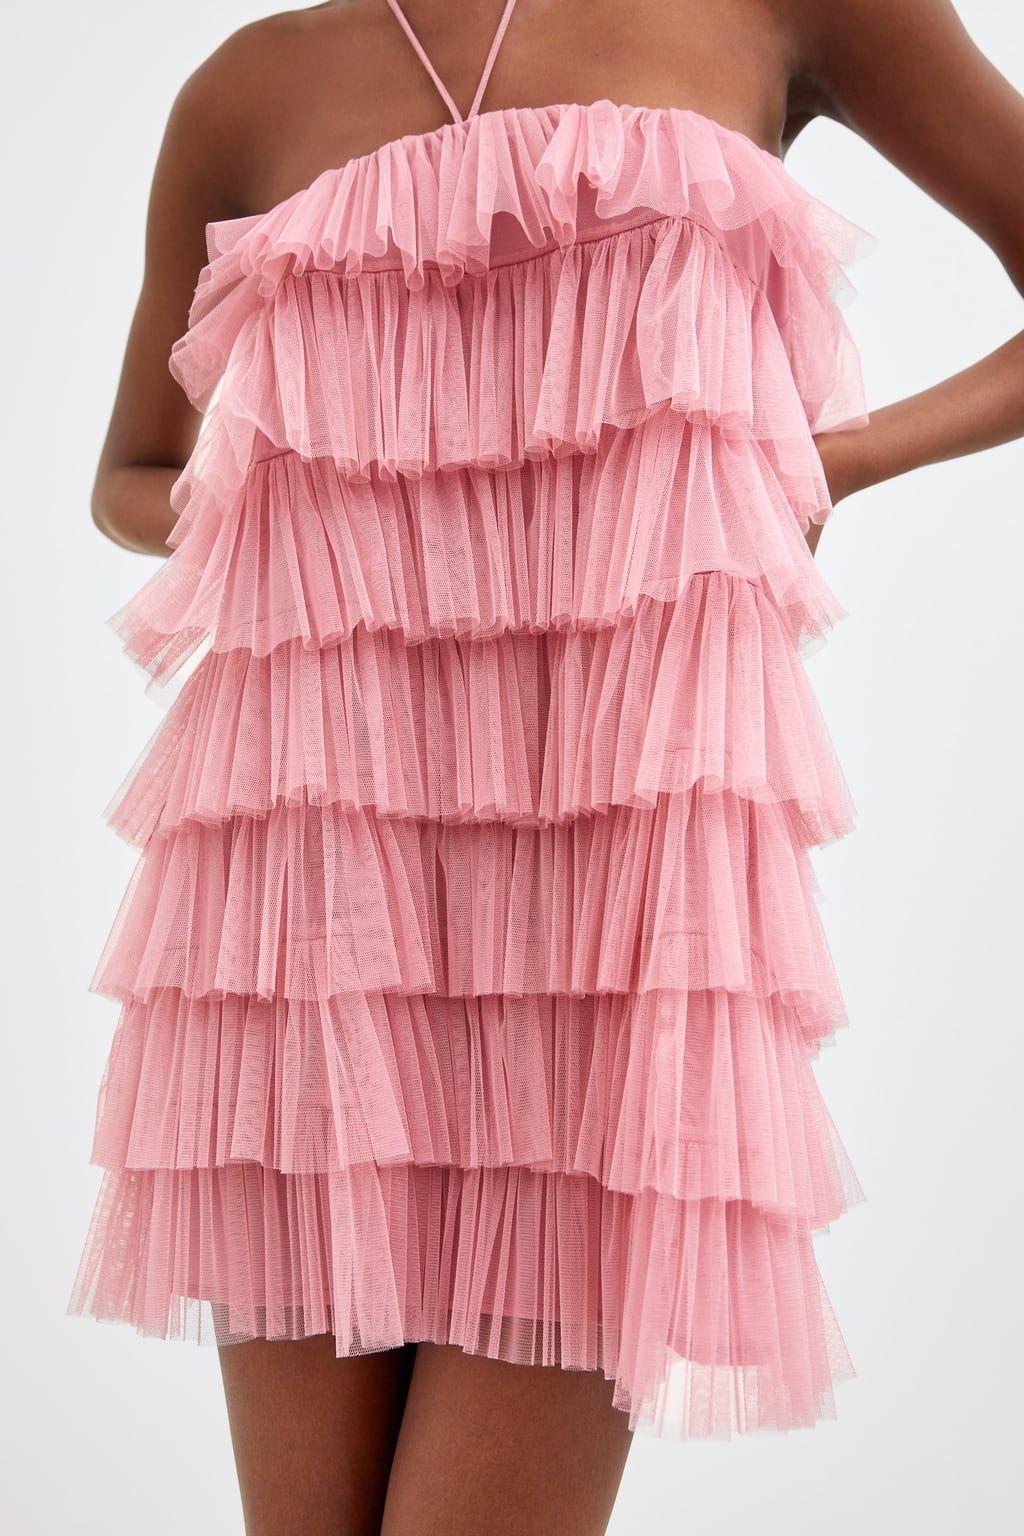 limited edition ruffled tulle dress | tulle, vestiti, volant